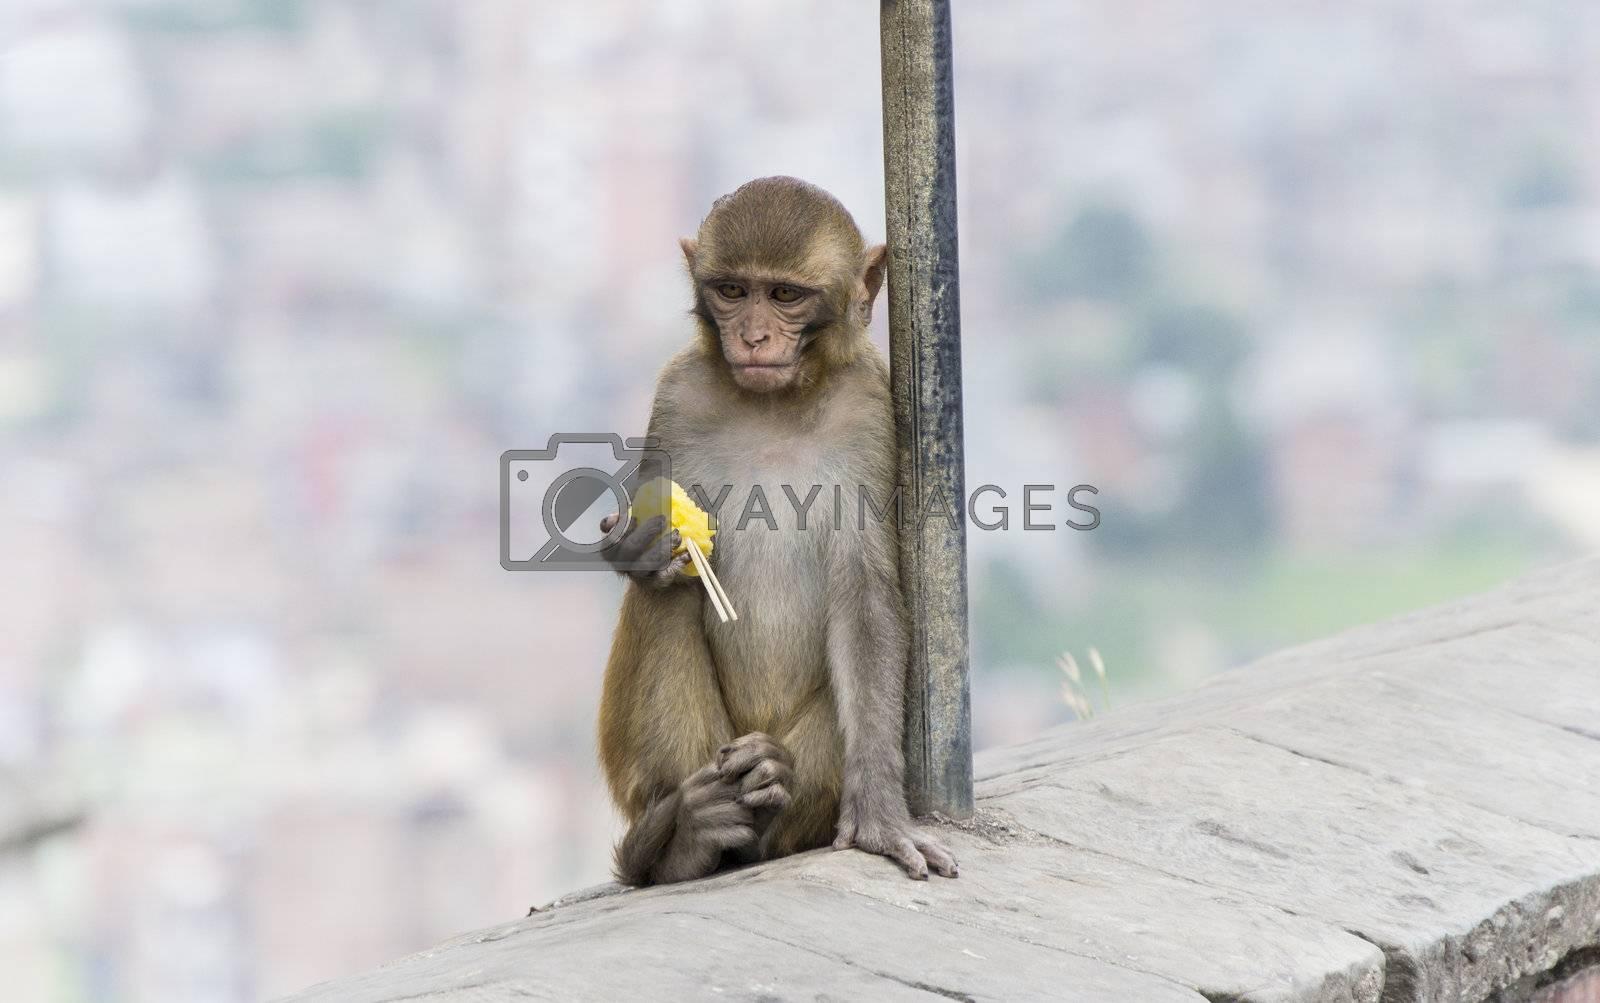 single monkey in nepal sitting on wall. vertical image.